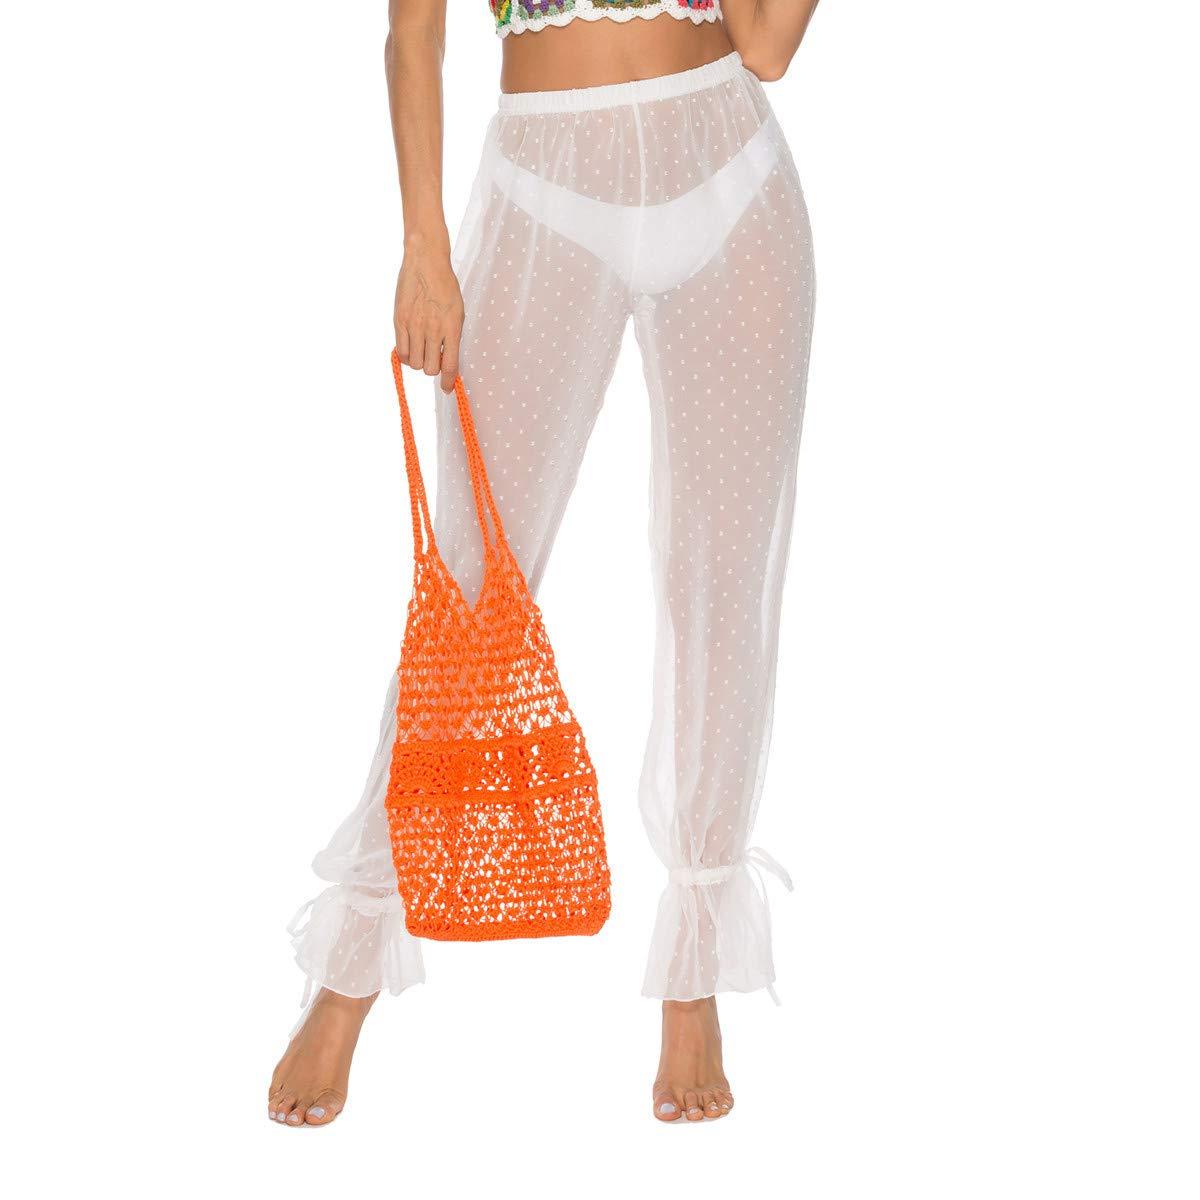 de587db1fed Riceei Women See Through Bikini Swimsuit Cover ups Pant Sexy Swimwear  Bathing Suit mesh Beach Pants White at Amazon Women's Clothing store: